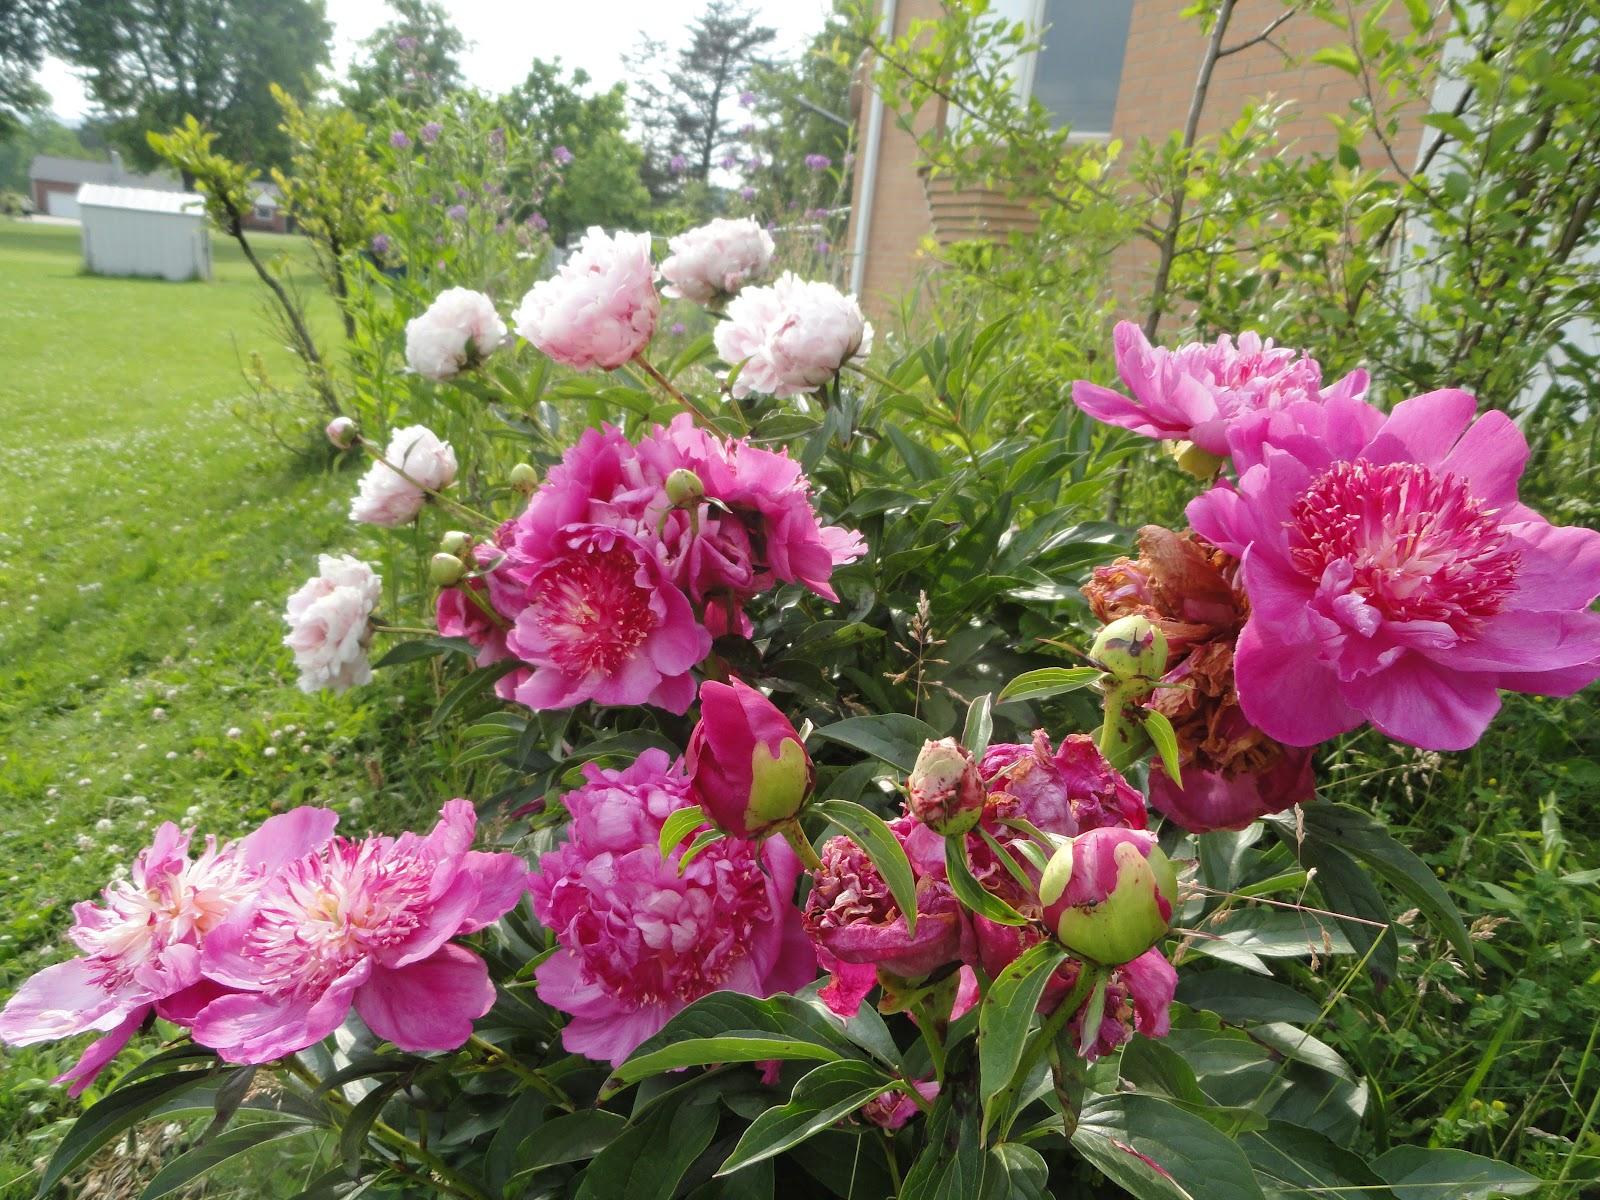 Dr Tsais Blog Peonies Bloom In May A Return To Grandeur